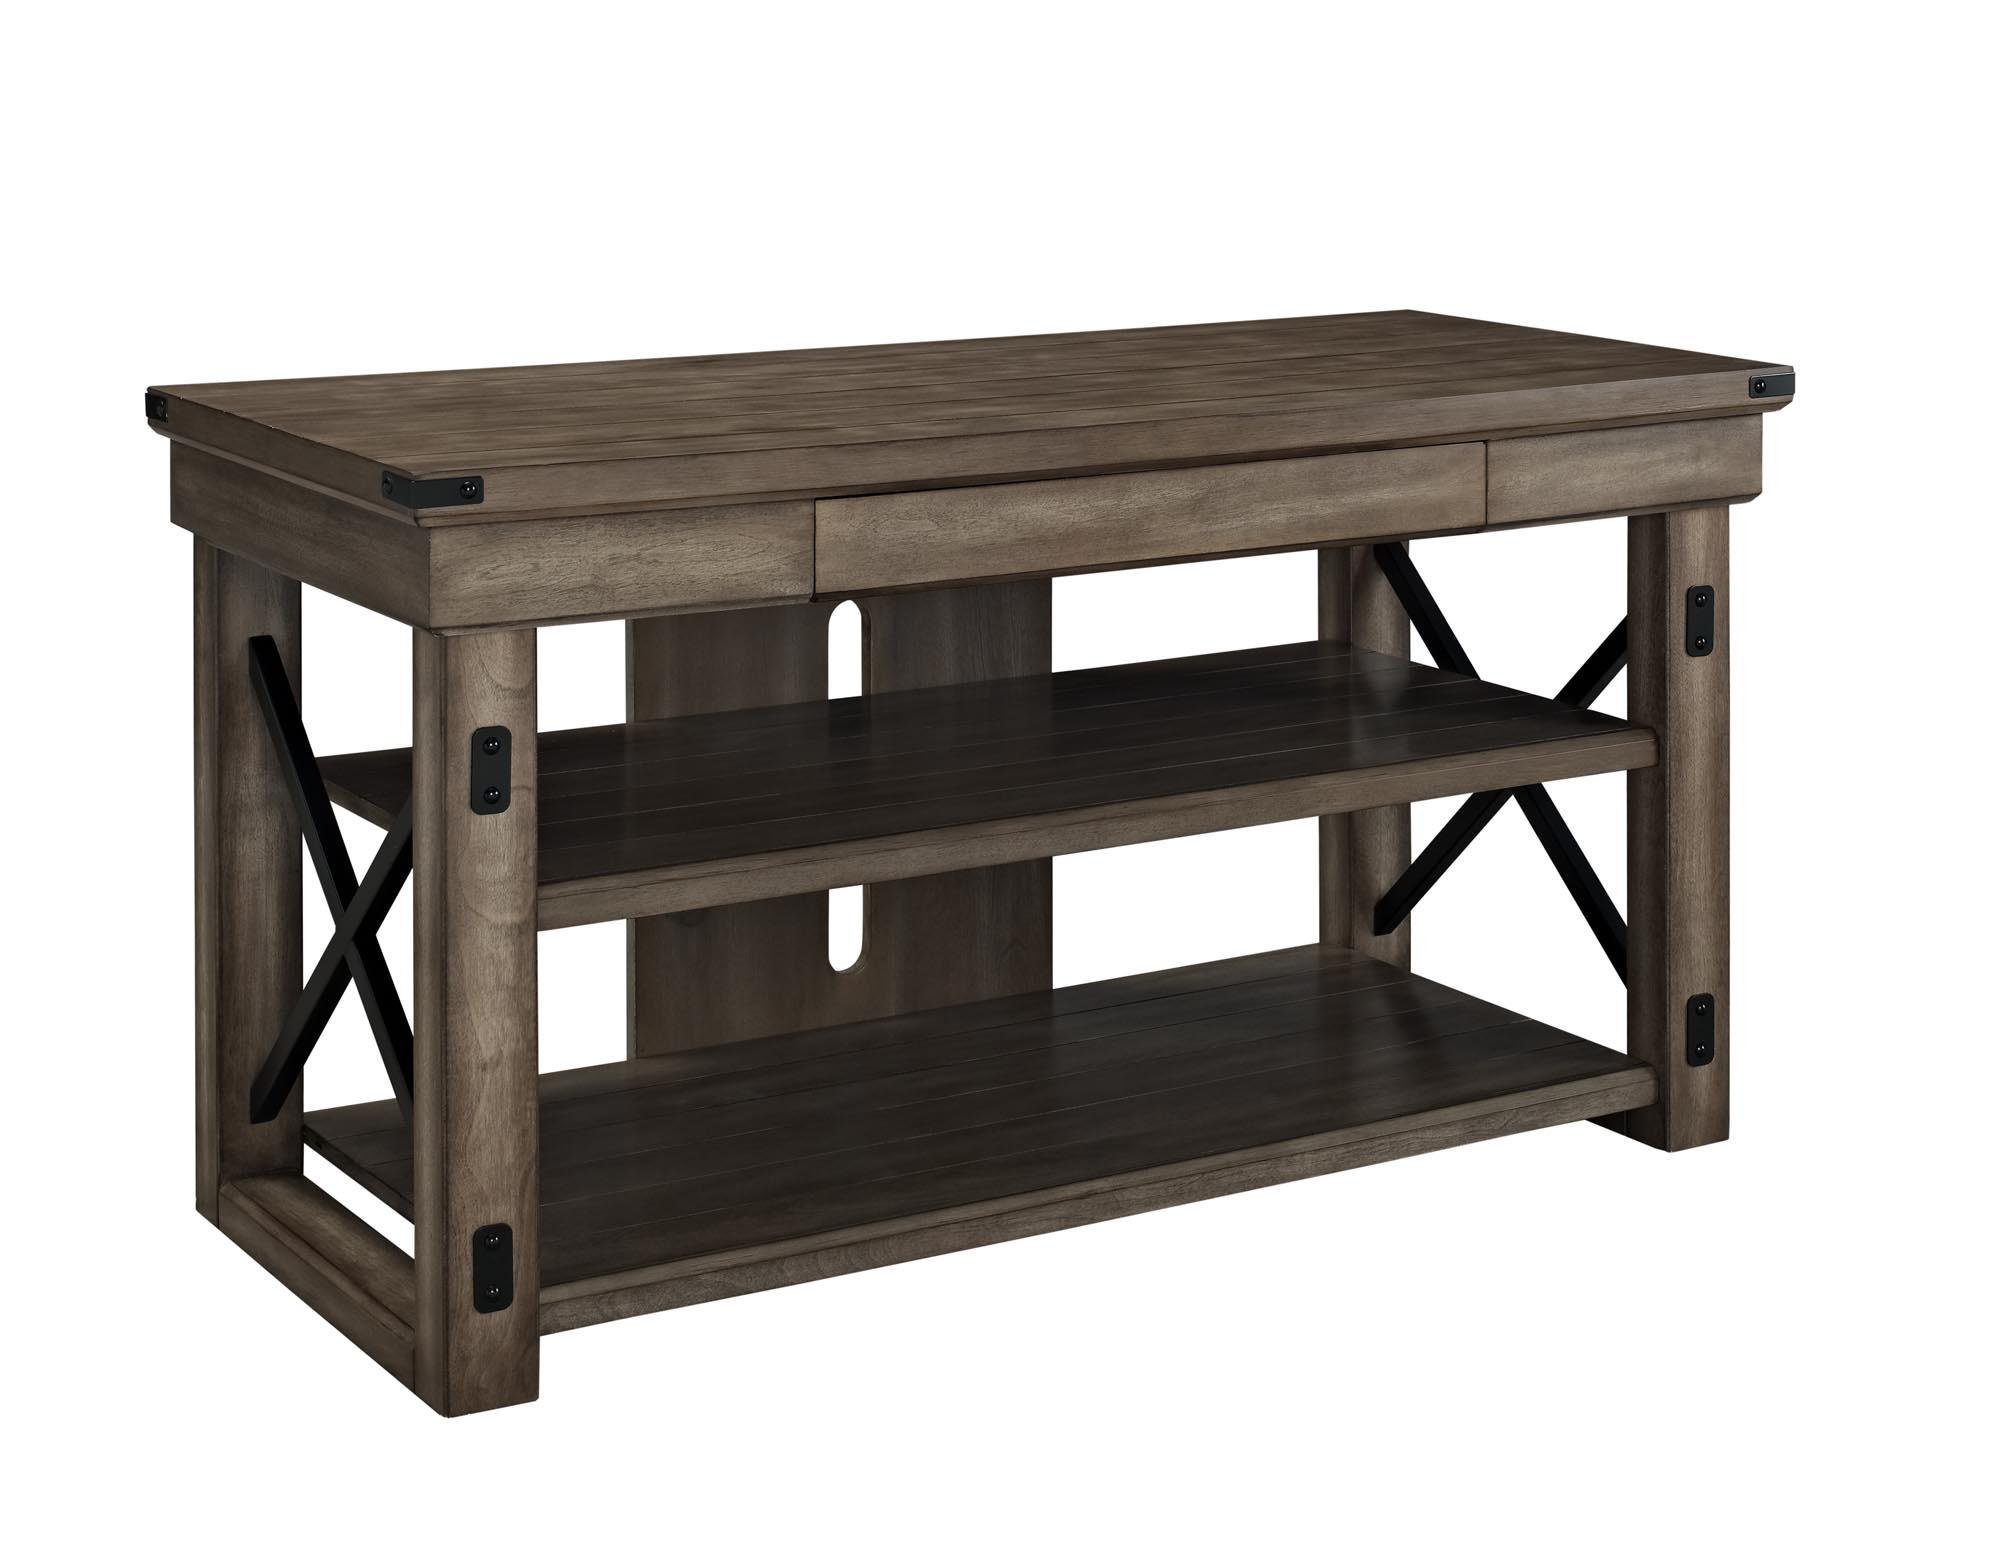 Ameriwood Home Wildwood Wood Veneer TV Stand for TVs up to 50'' Wide, Rustic Gray